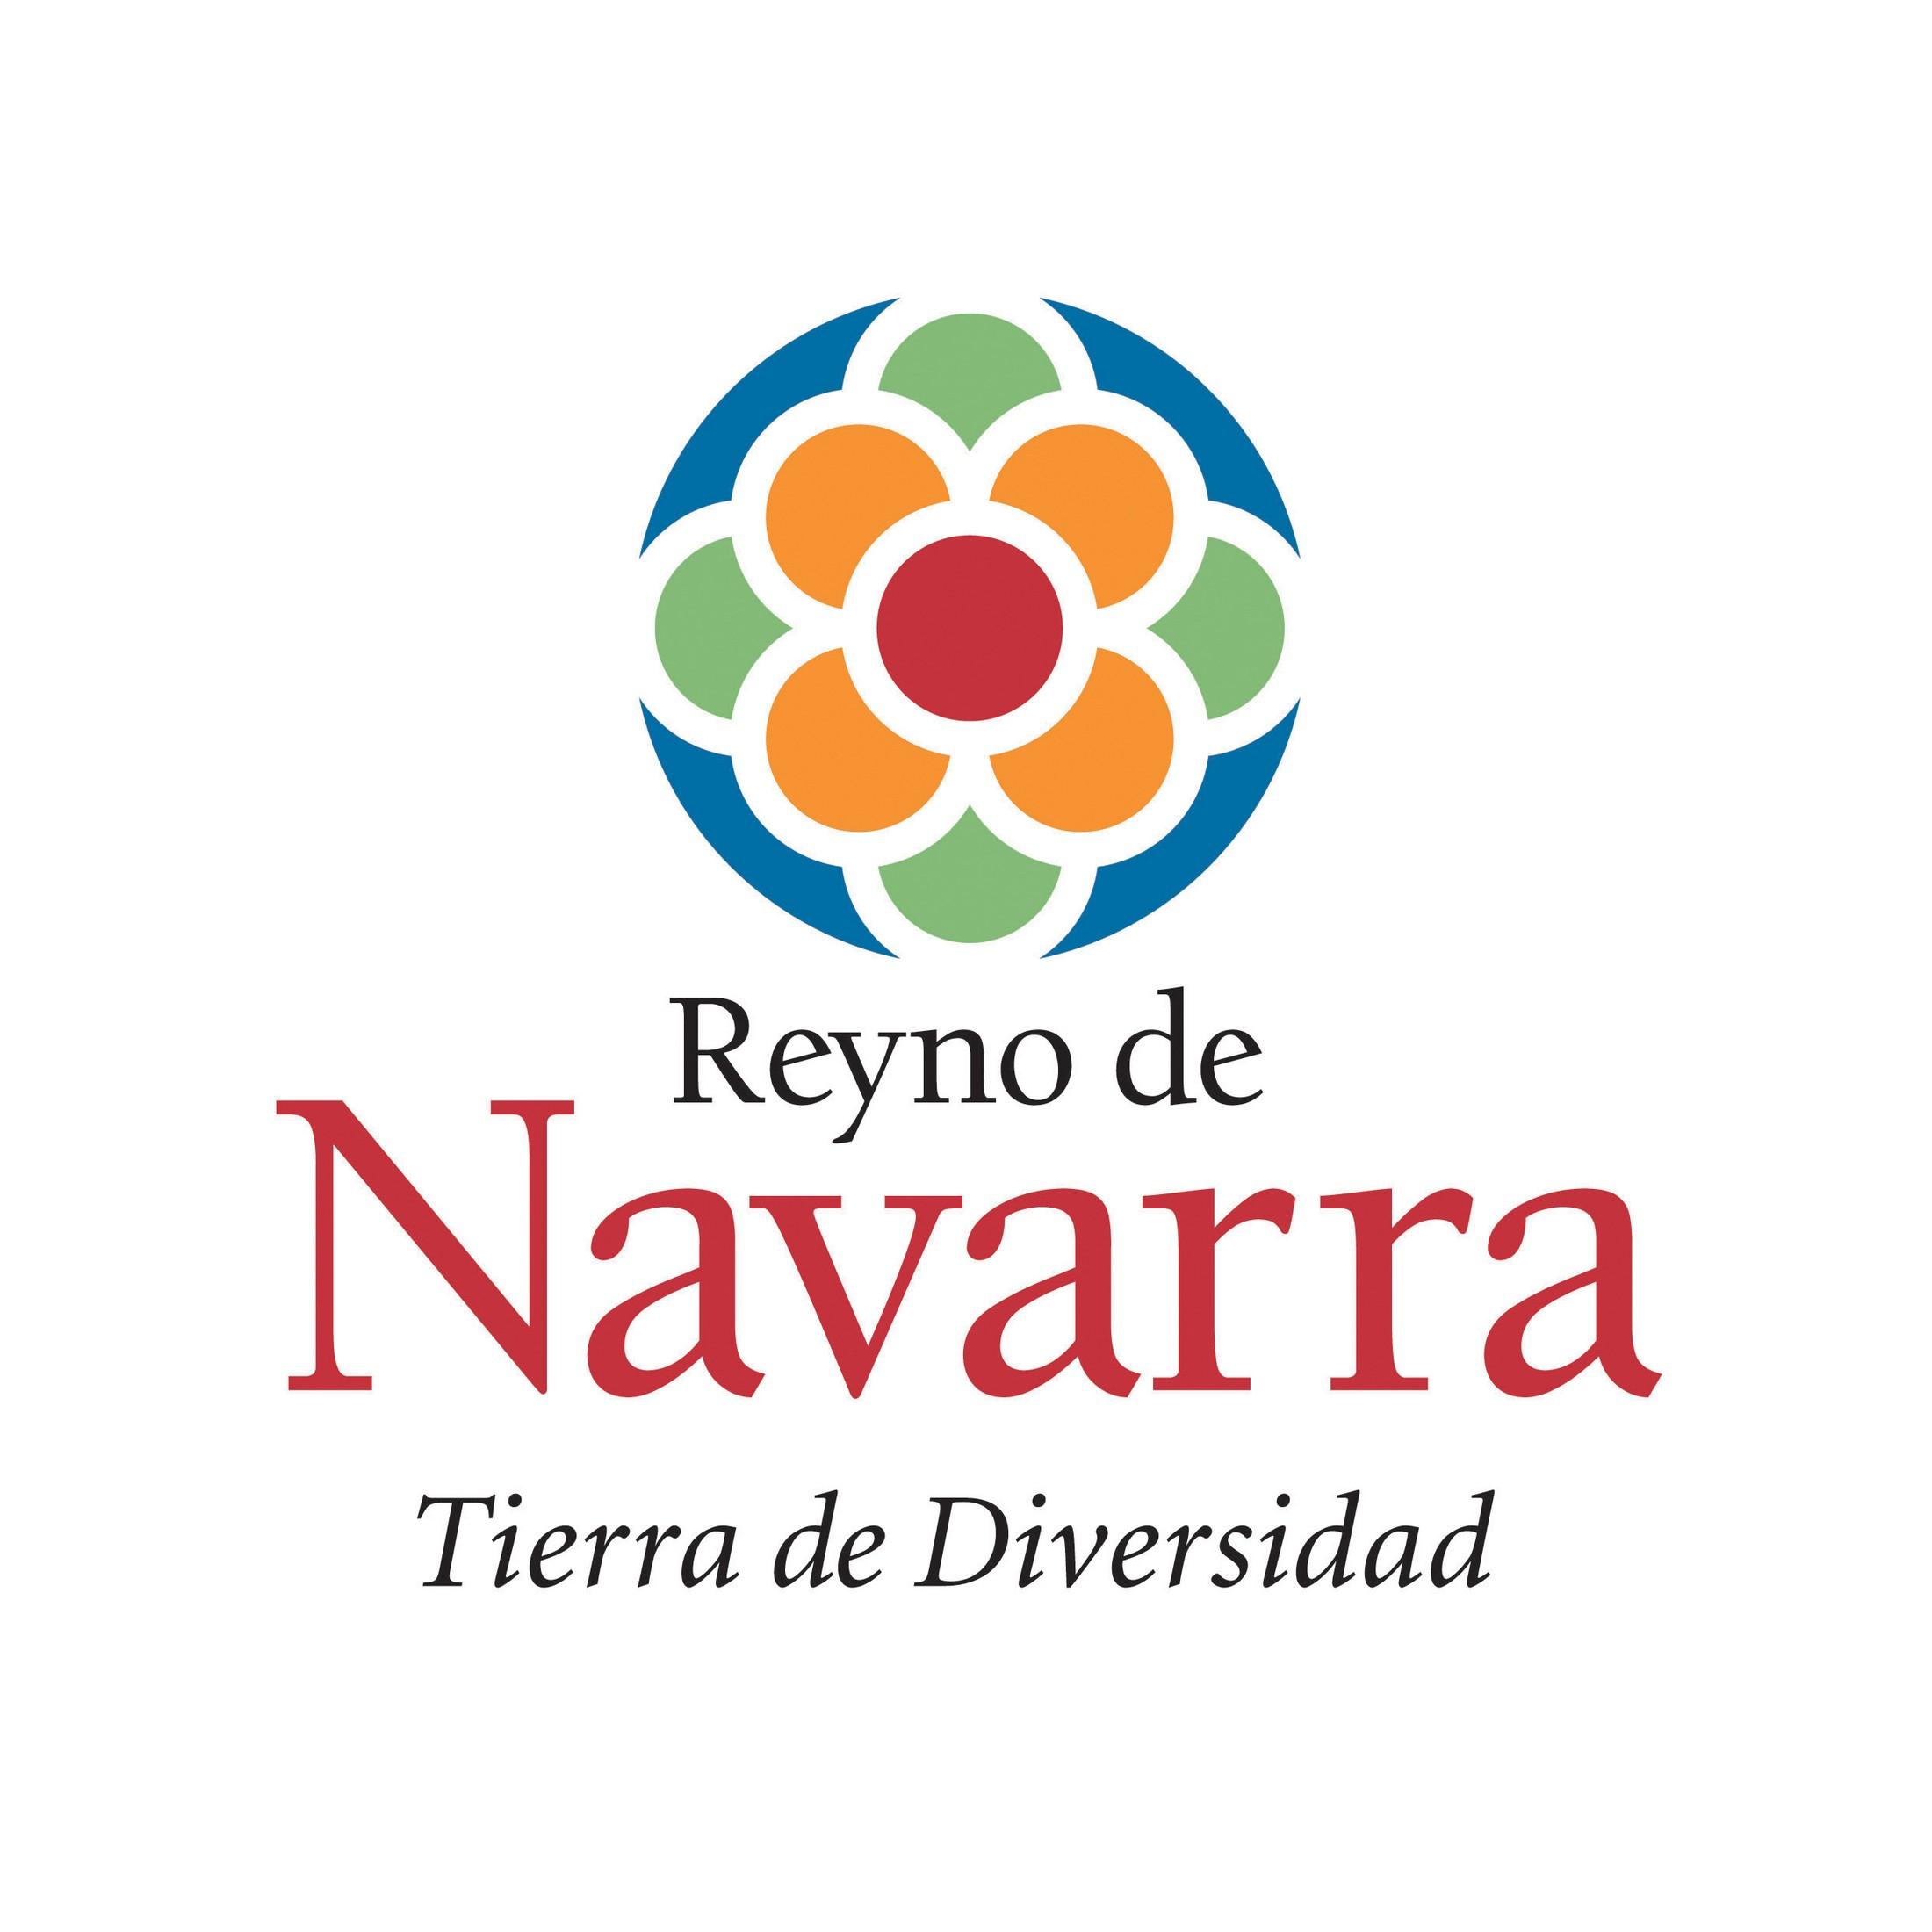 Logo Reyno de Navarra